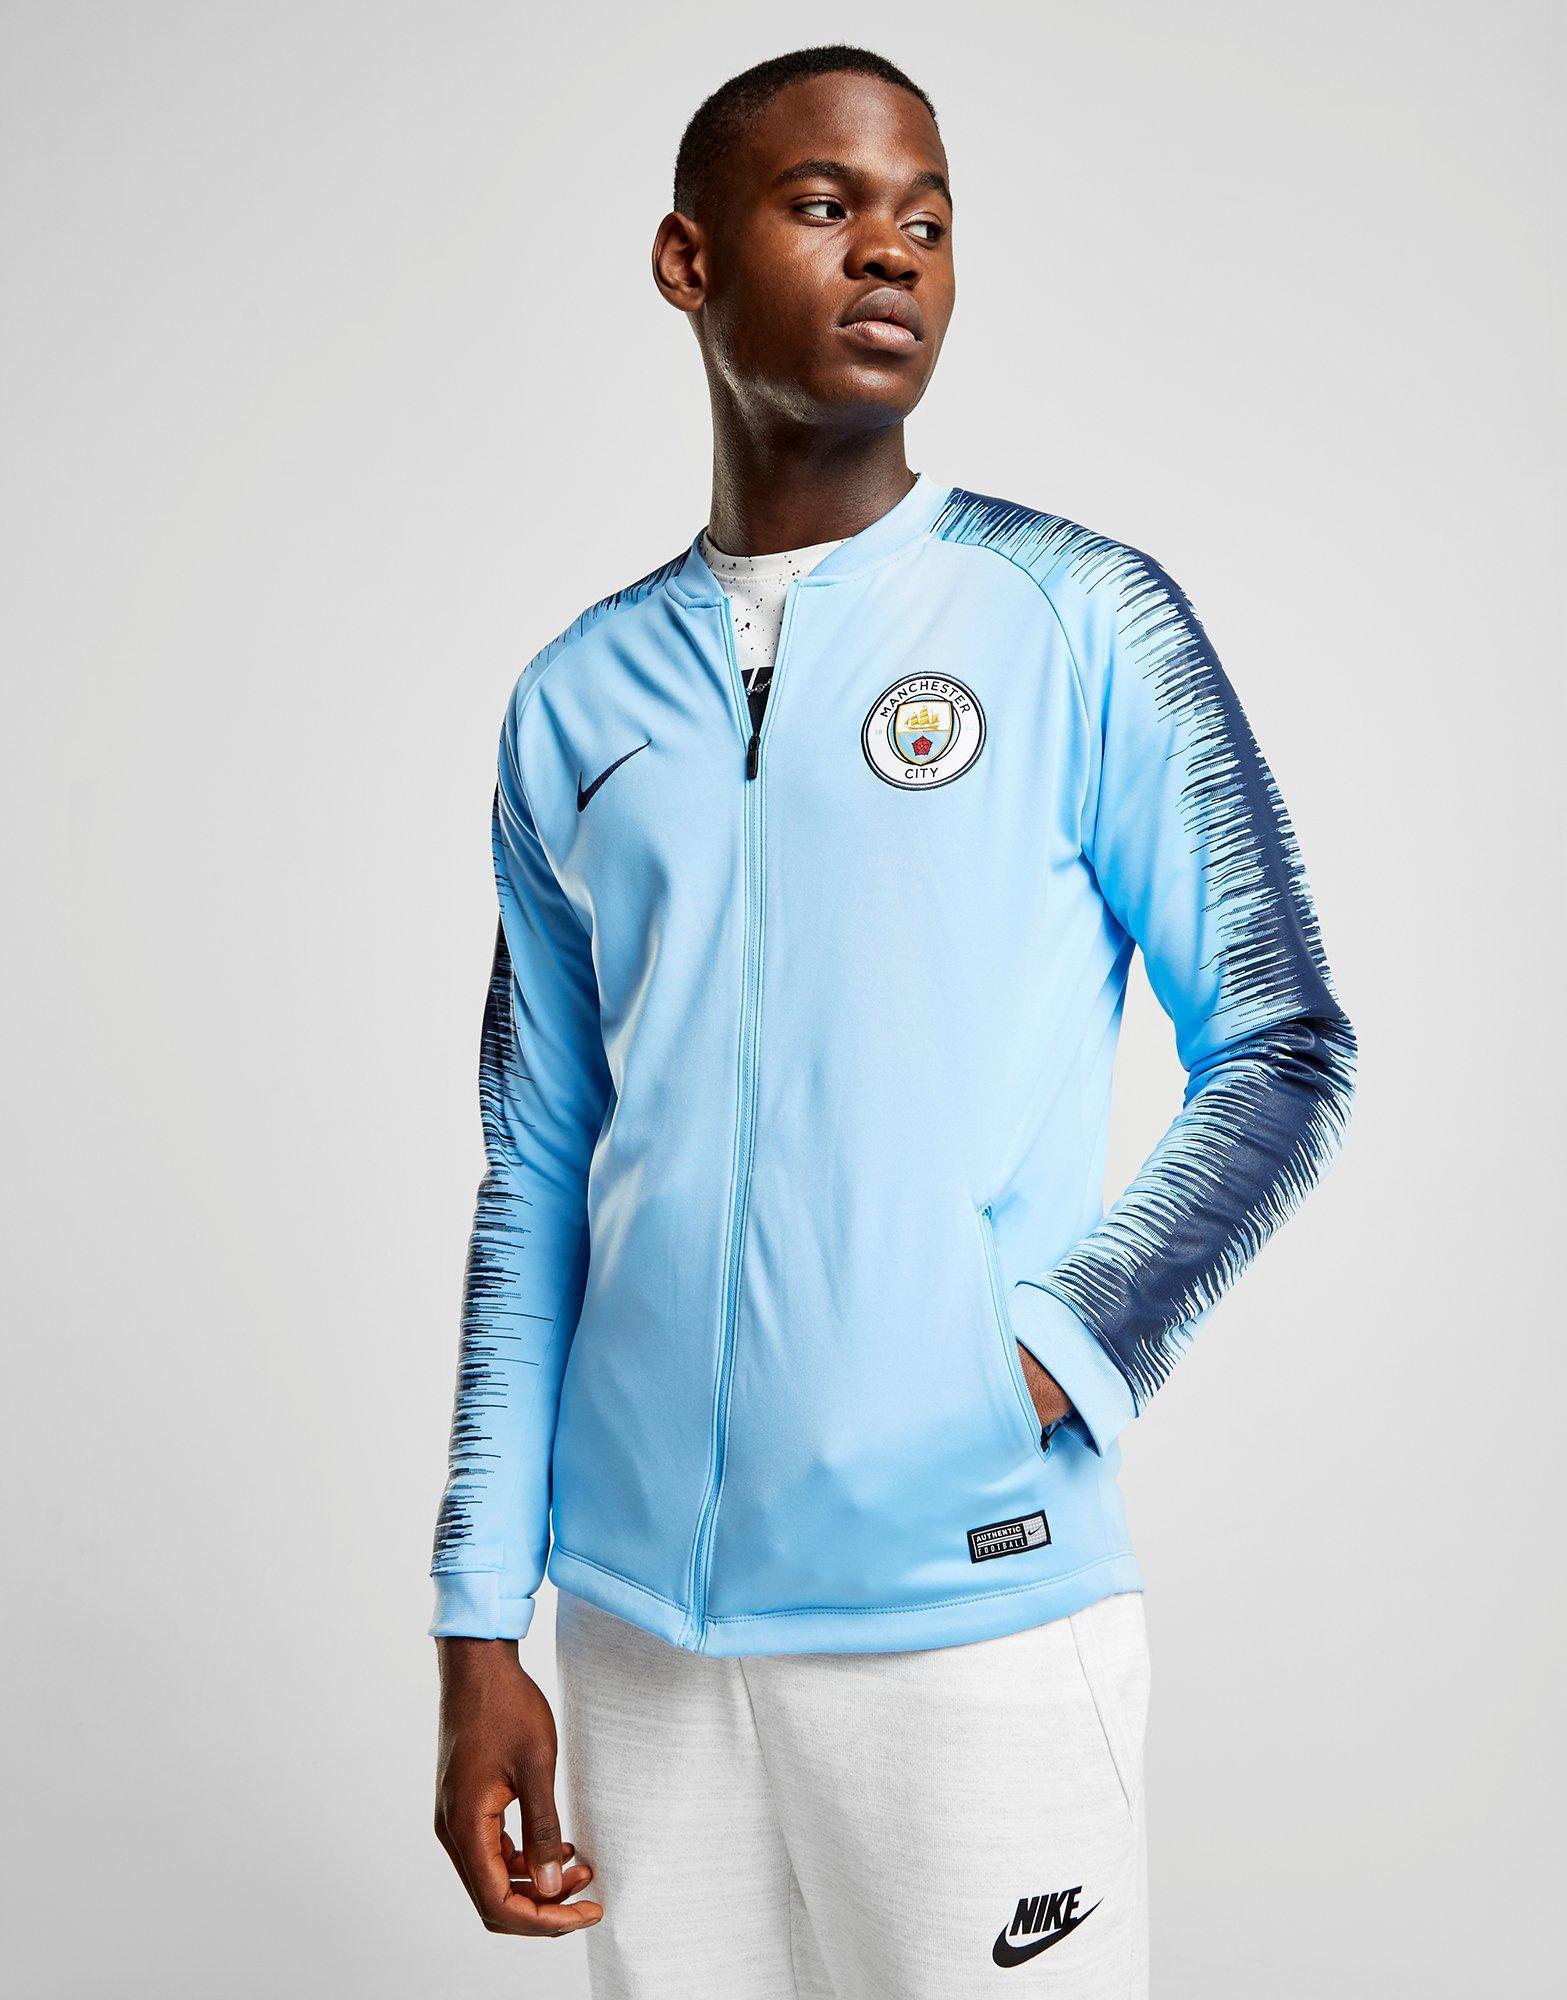 3cf28c1c54 nike manchester city fc anthem jacket in blue for men – lyst. Download  Image 1567 X 2000